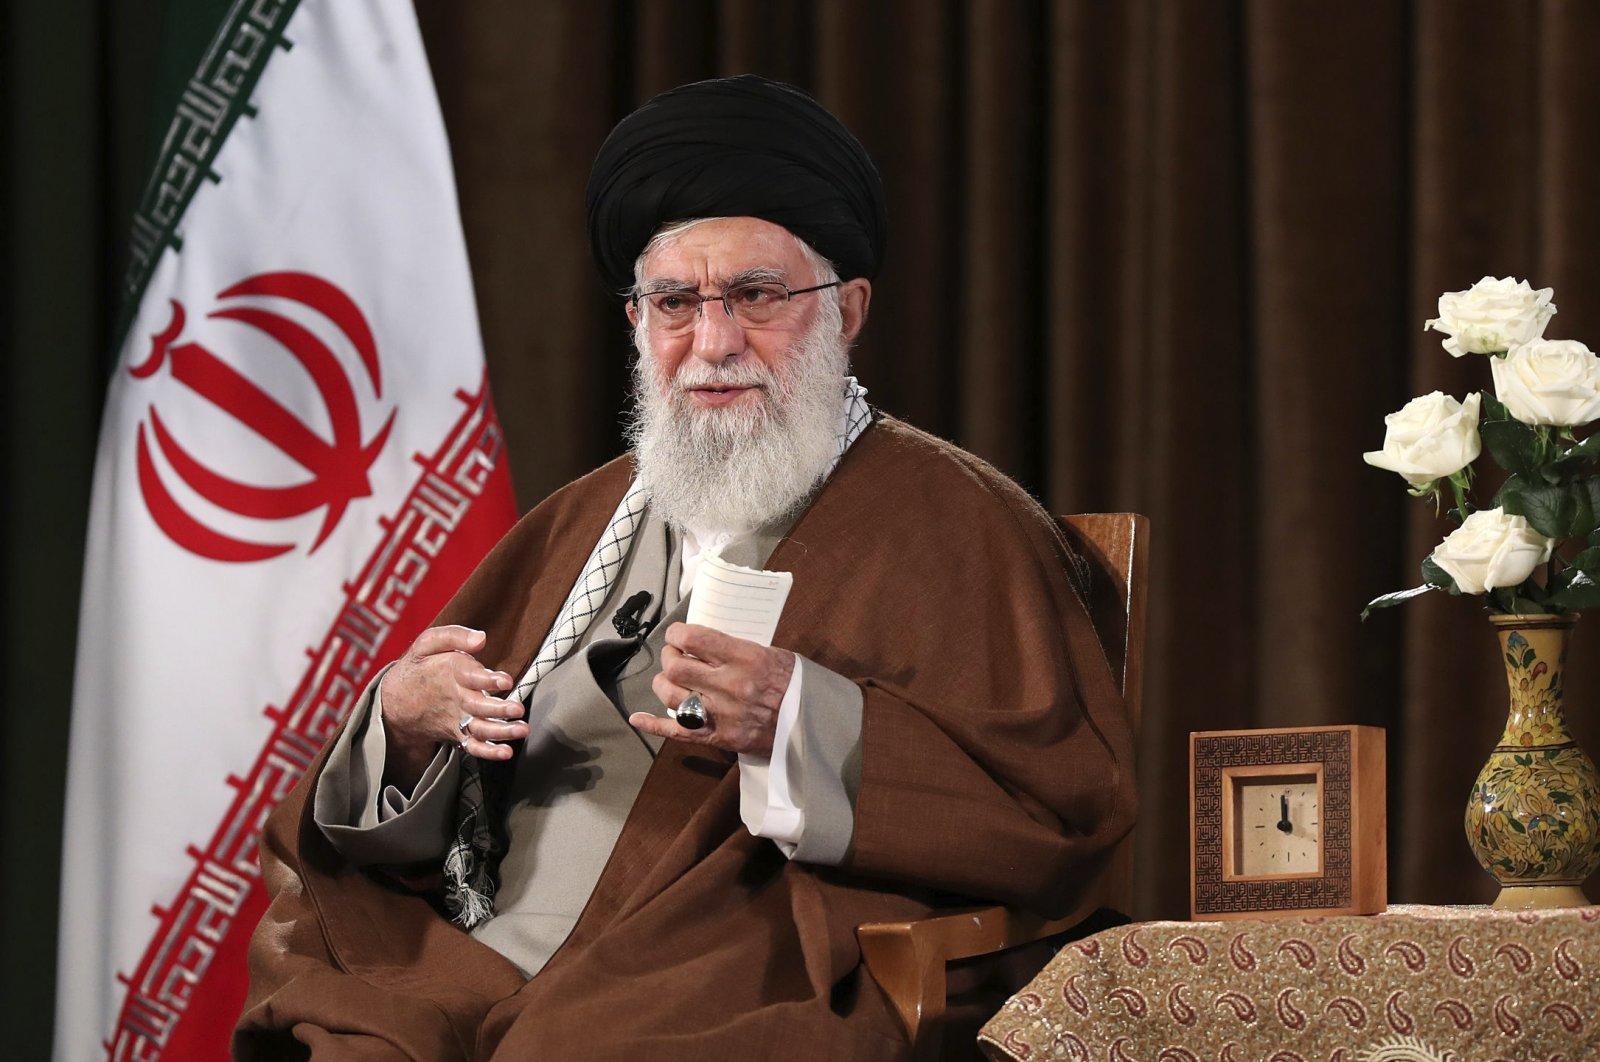 Supreme Leader Ayatollah Ali Khamenei addresses the nation on a televised speech, in Tehran, Iran, Sunday, March 22, 2020. (AP Photo)